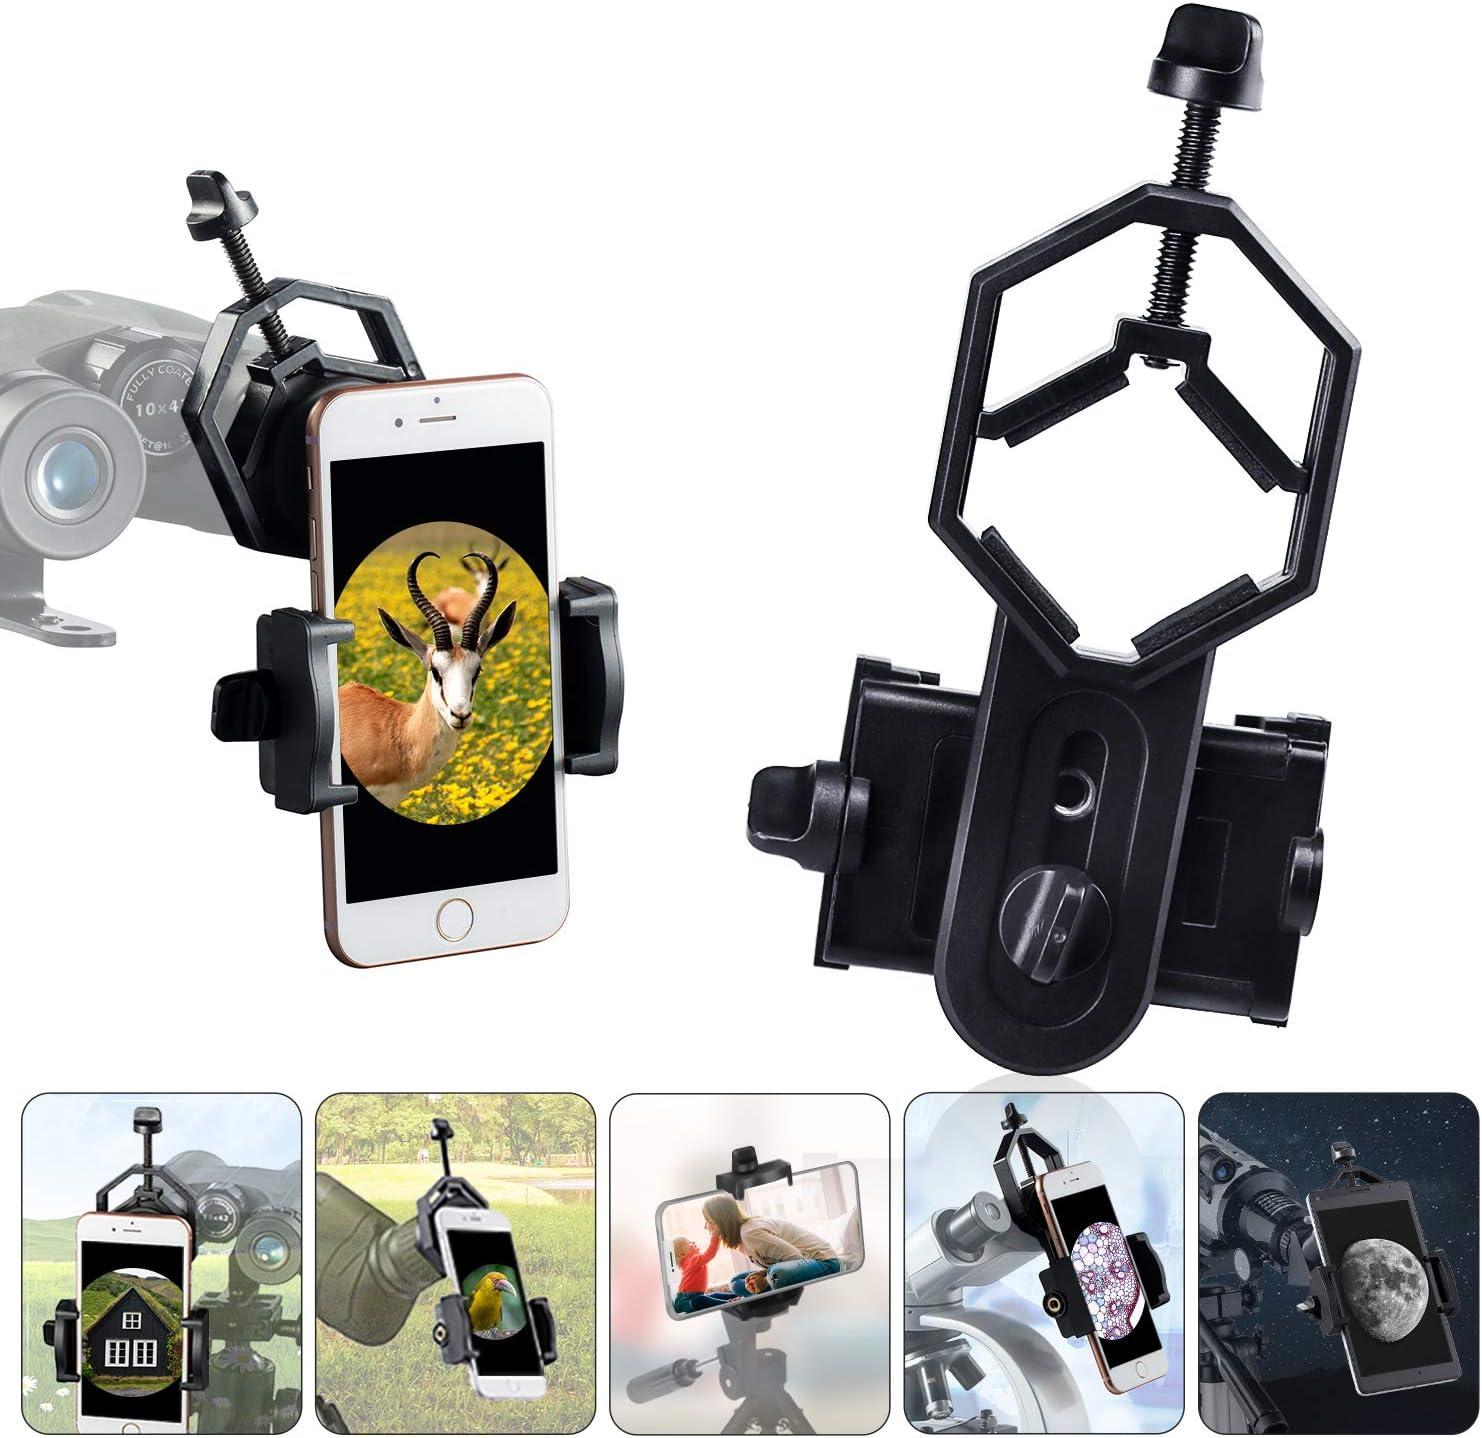 Useful Spotting Scope Telescope Mount Digital Camera Mobile Phone Adapter YNFK